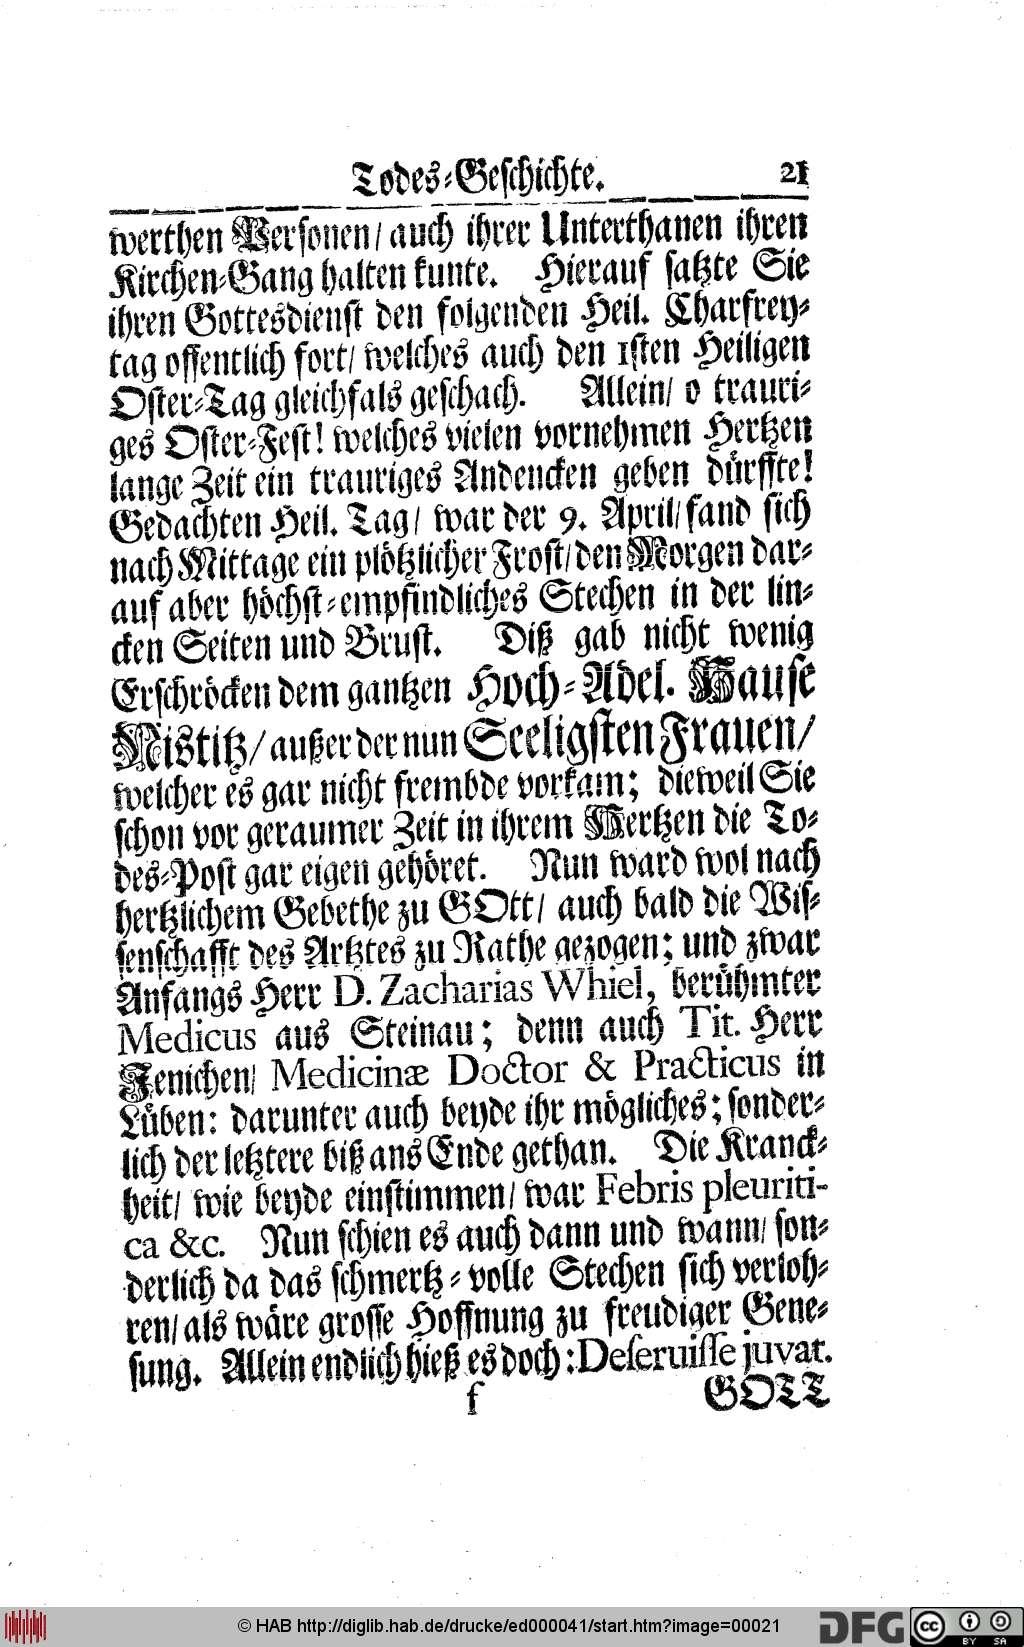 http://diglib.hab.de/drucke/ed000041/00021.jpg